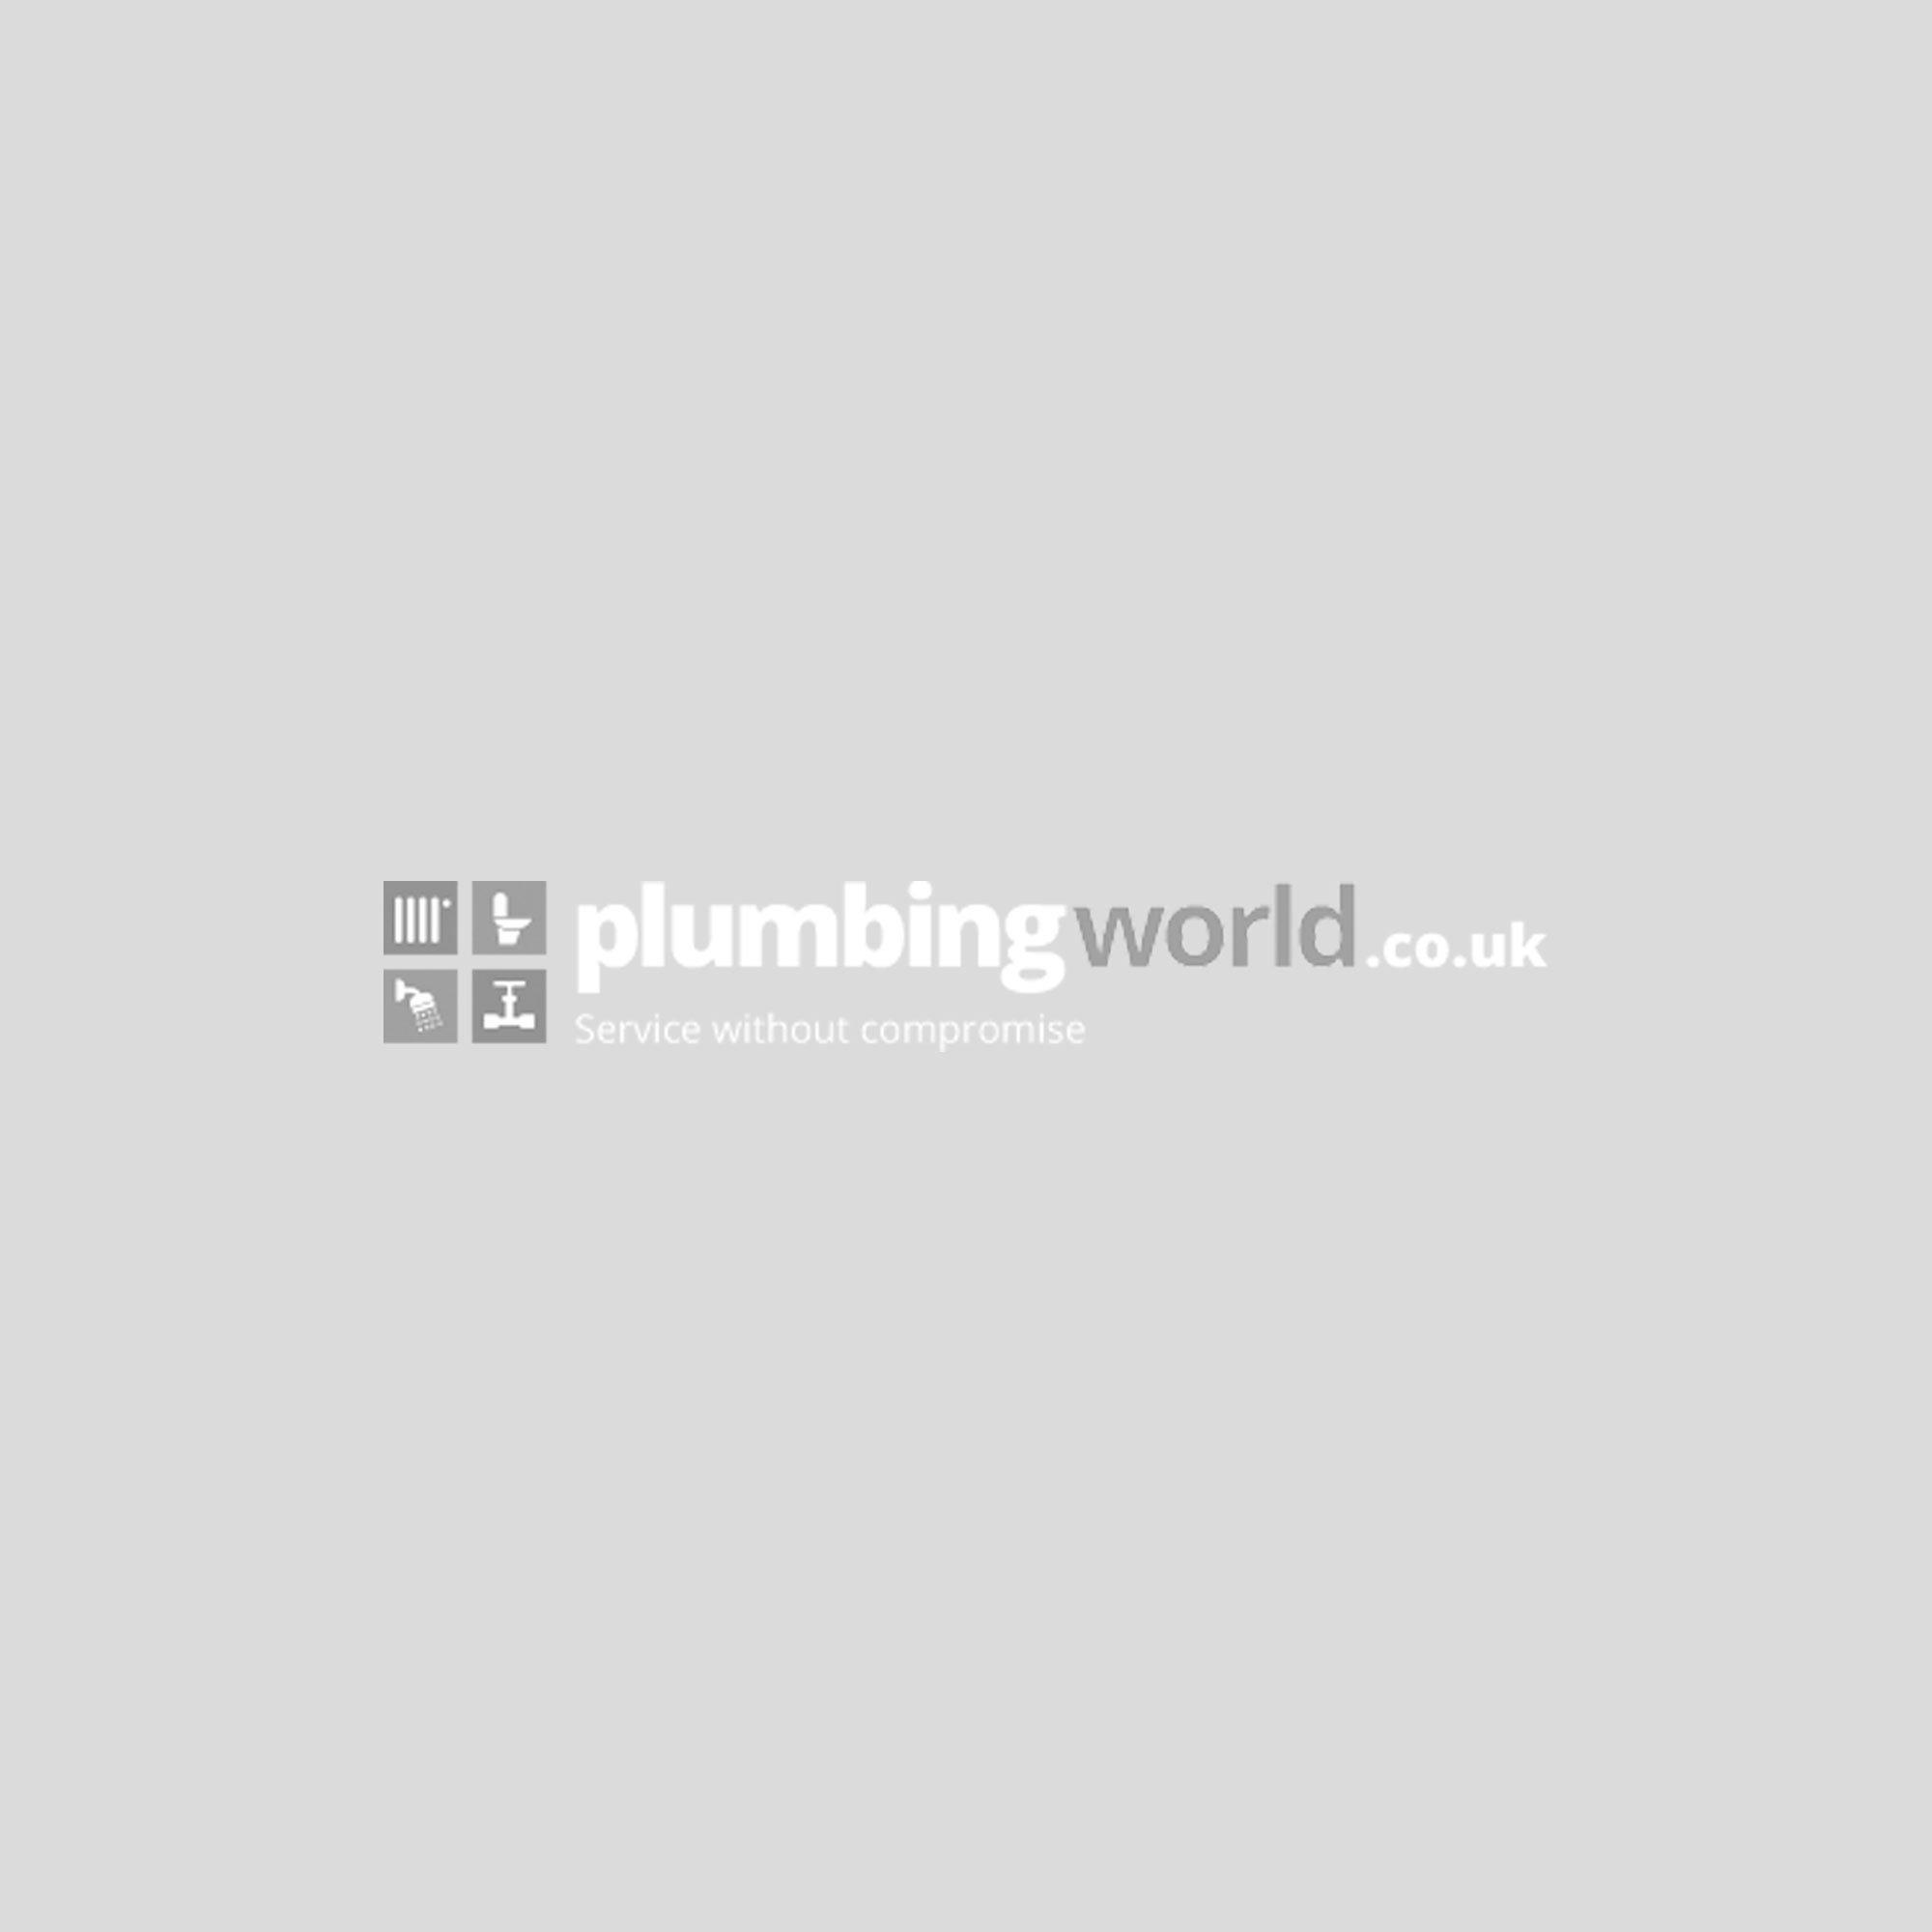 Worcester Greenstar Heatslave 2 18/25 Floor Standing External Oil Fired ErP Combi Boiler - 7731600169